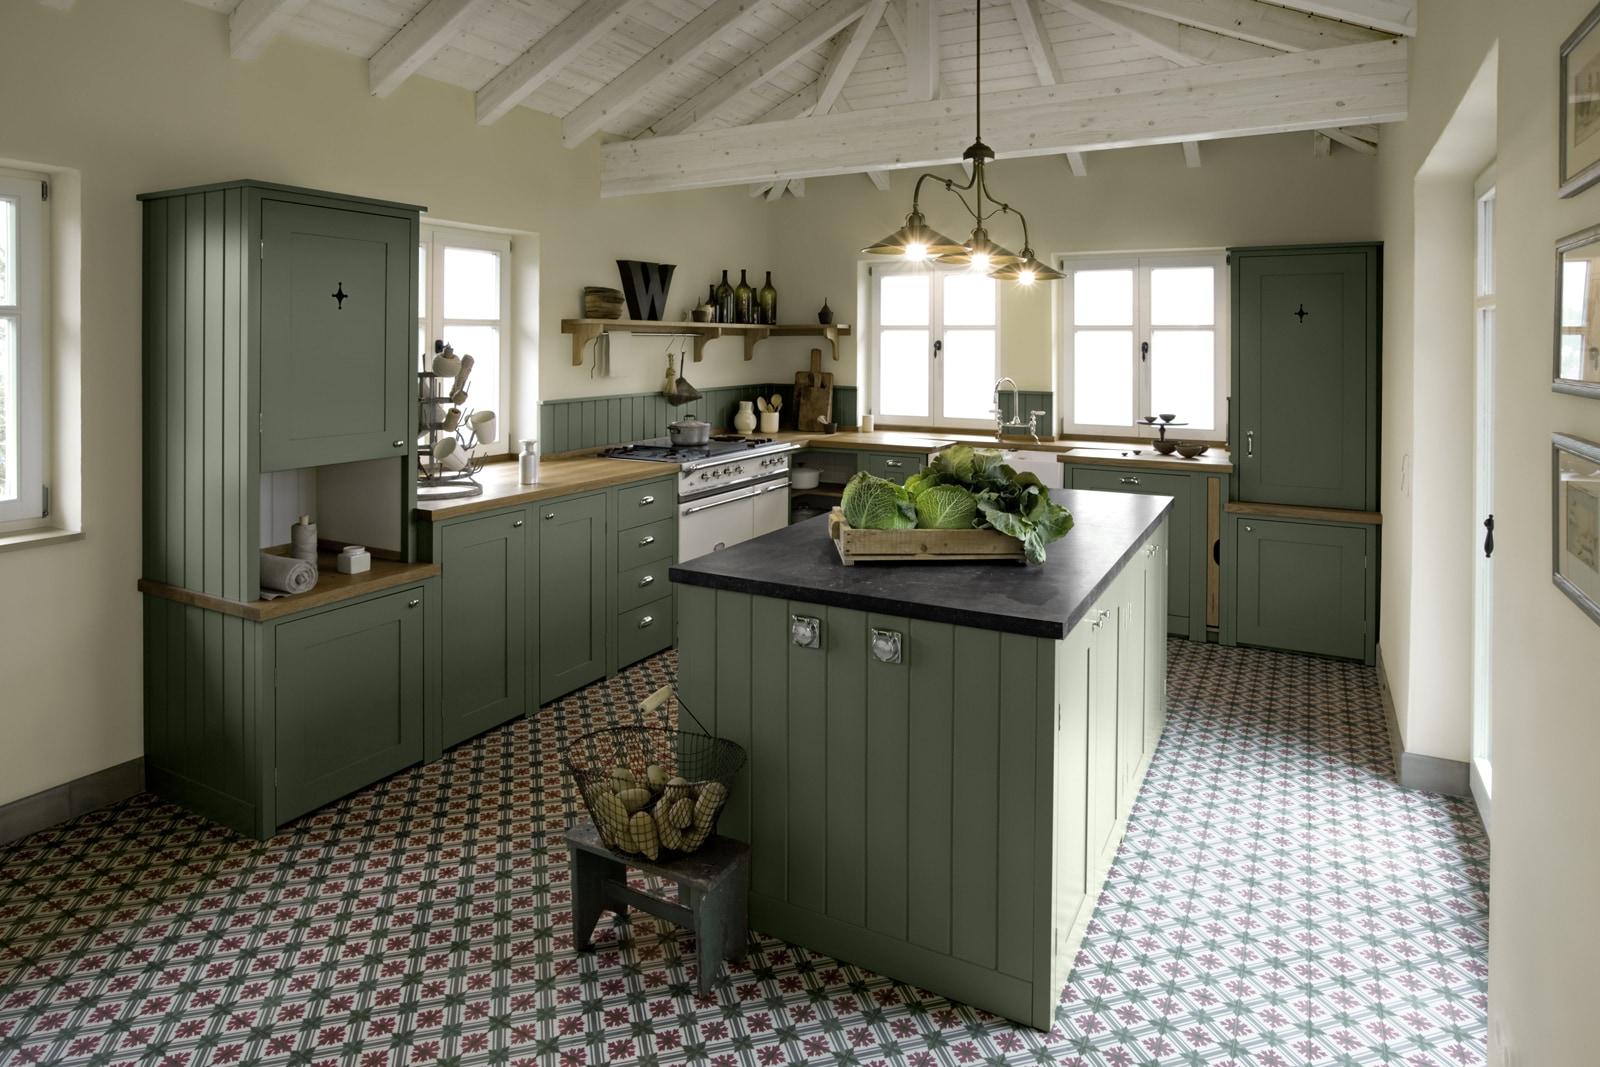 Shakerküche Woodworker mit VIA Zementfliese